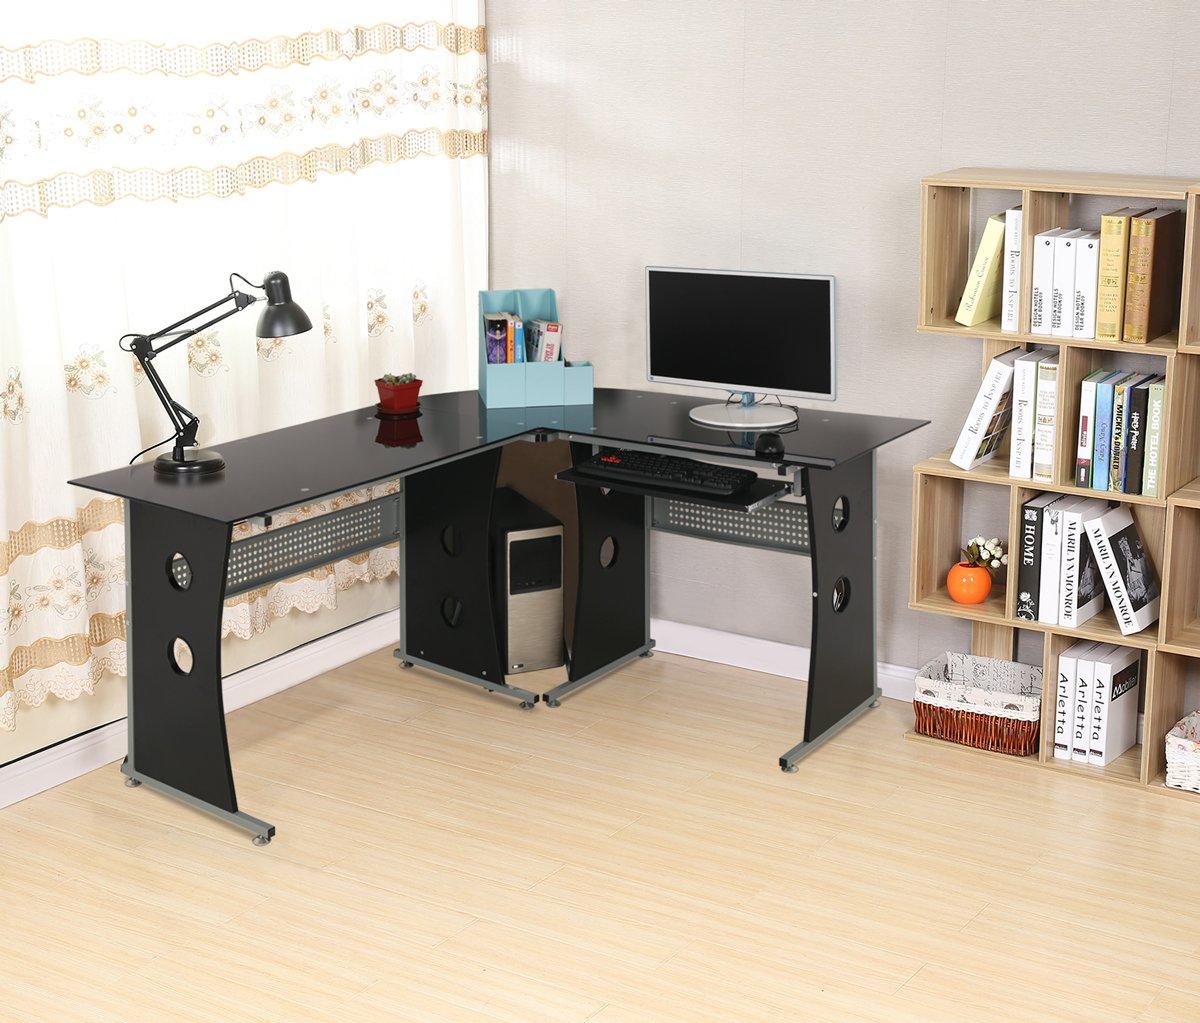 HLC Tempered Glass L Shaped Corner Computer Desk Home/Office Workstation  With Interchangeable Desktops And Pull Out Keyboard Shelf 160cm * 135cm *  75CM: ...